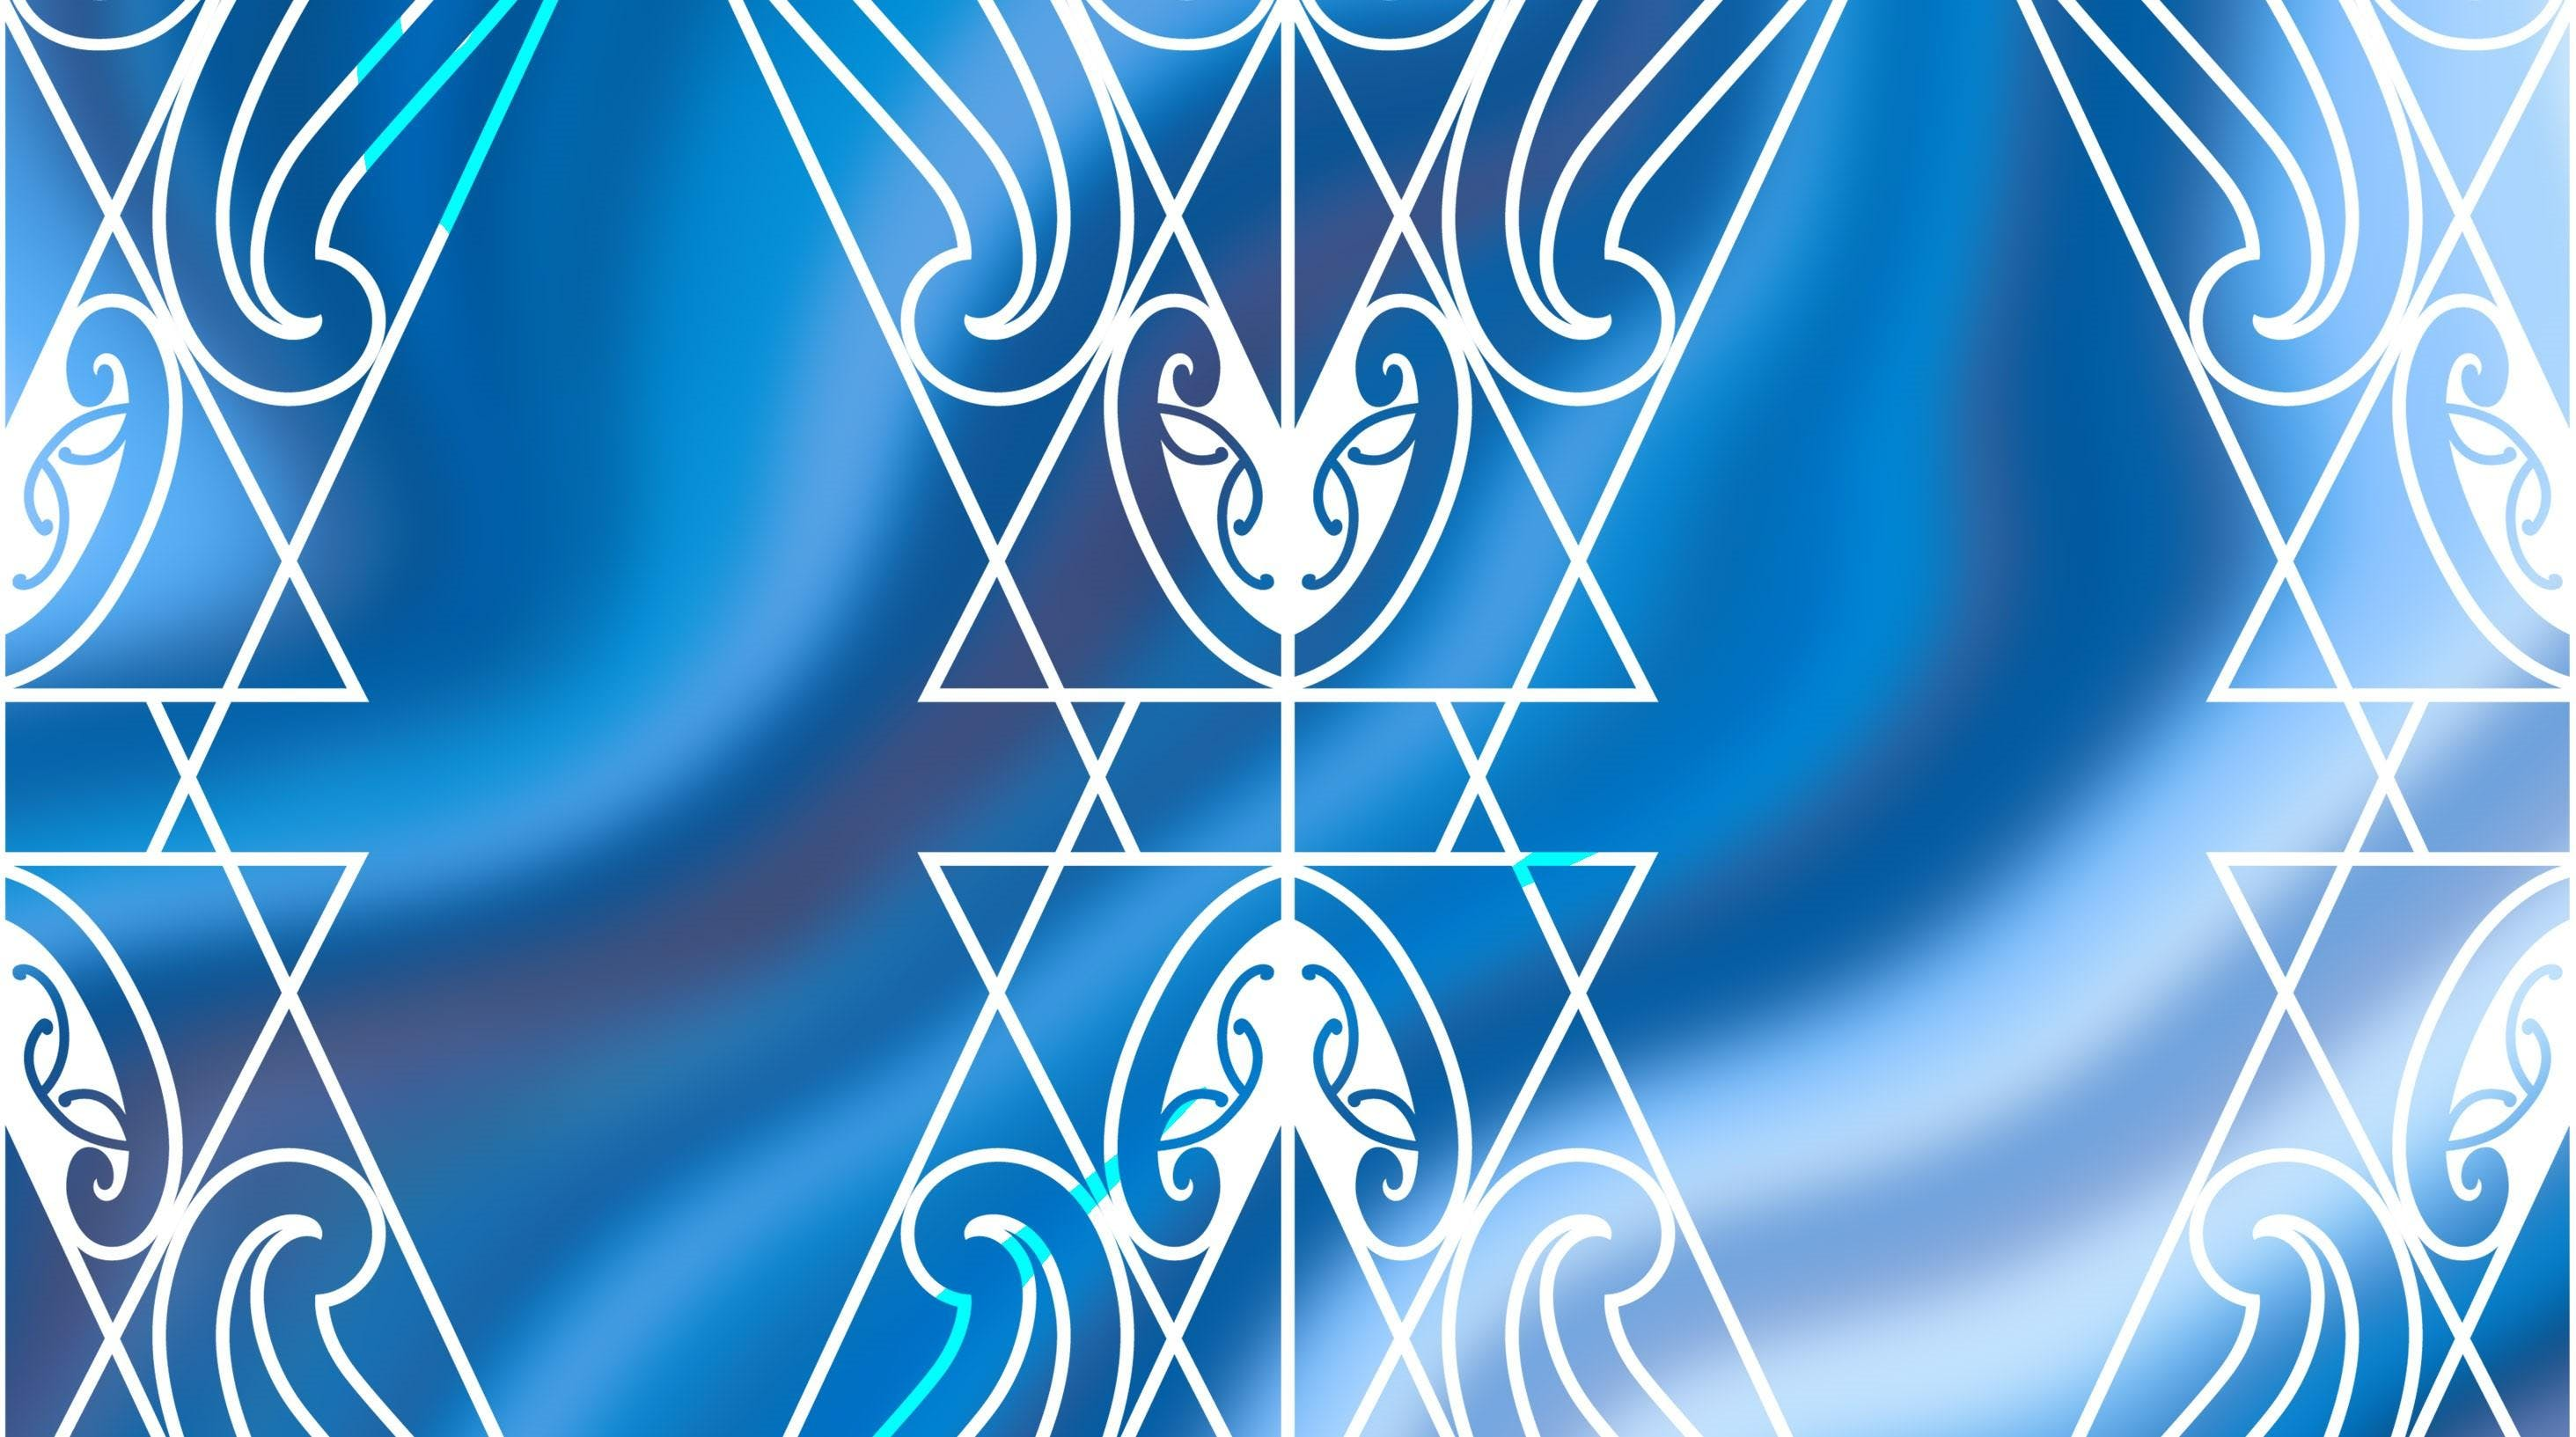 Hui Maumahara Finding the healer within Hinewirangi Kohu Morgan - Waikato